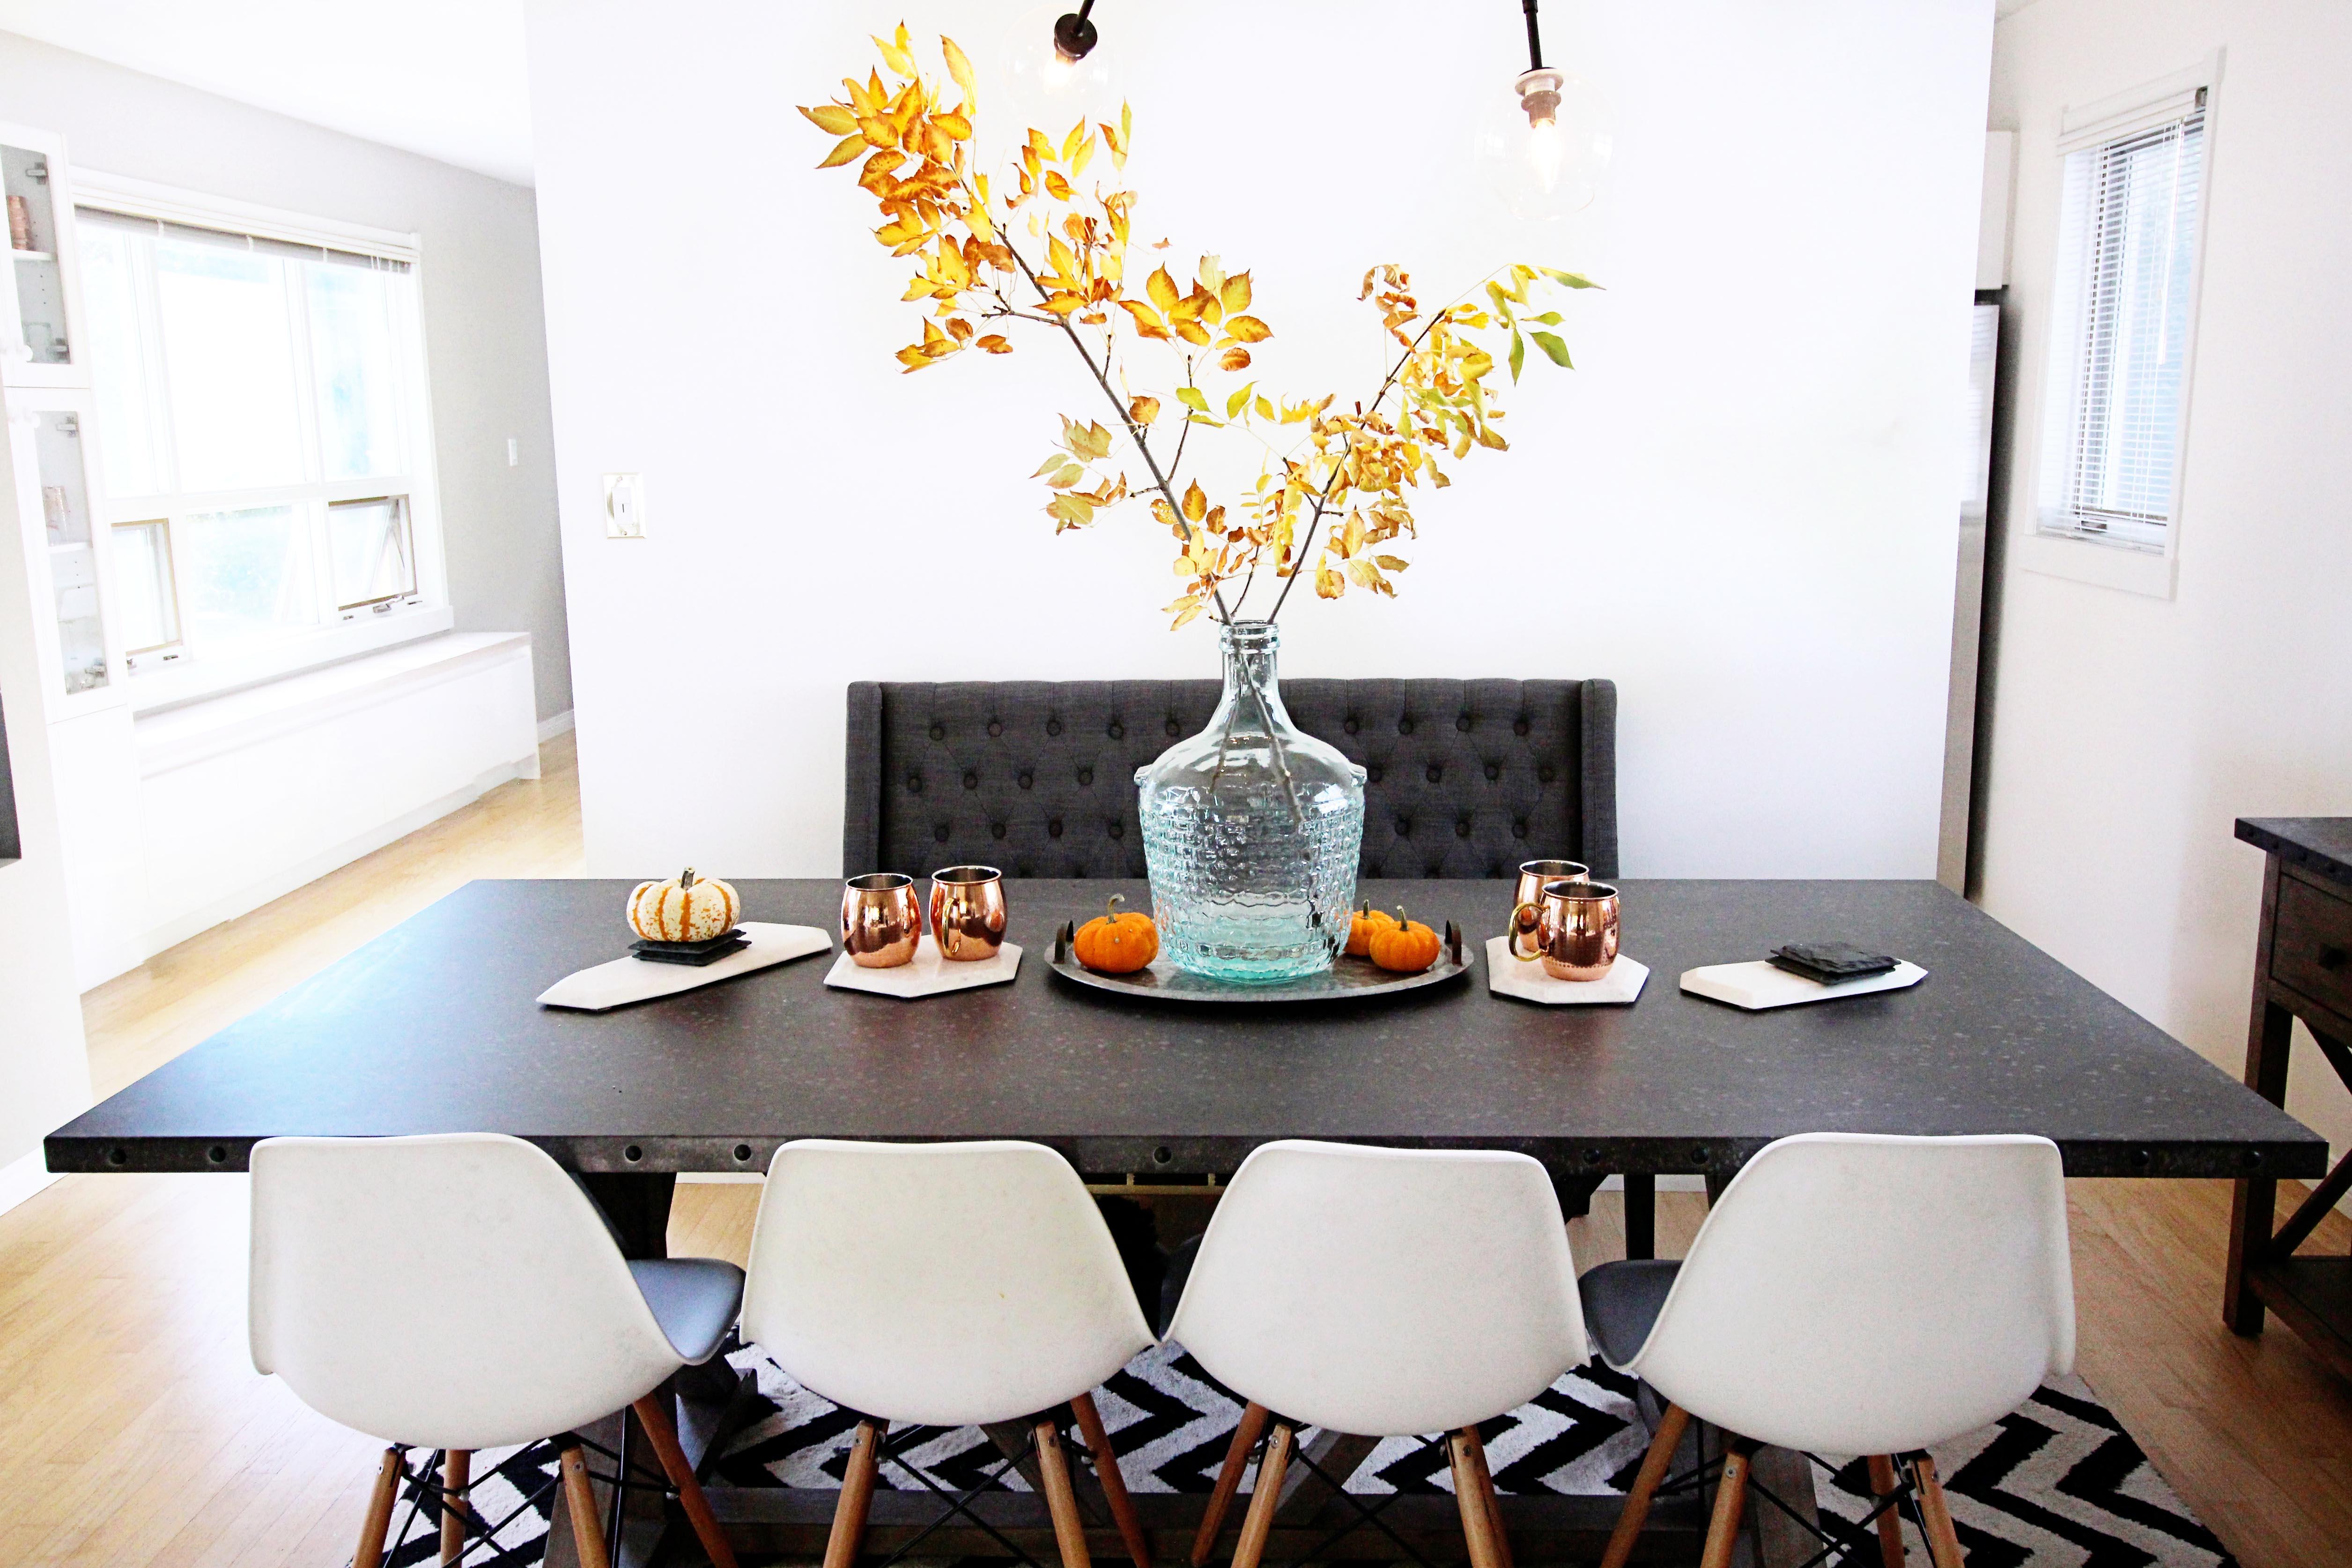 Lifestyle || My Fall Home Decor Tour || Canadian Blogger Home Tour ...